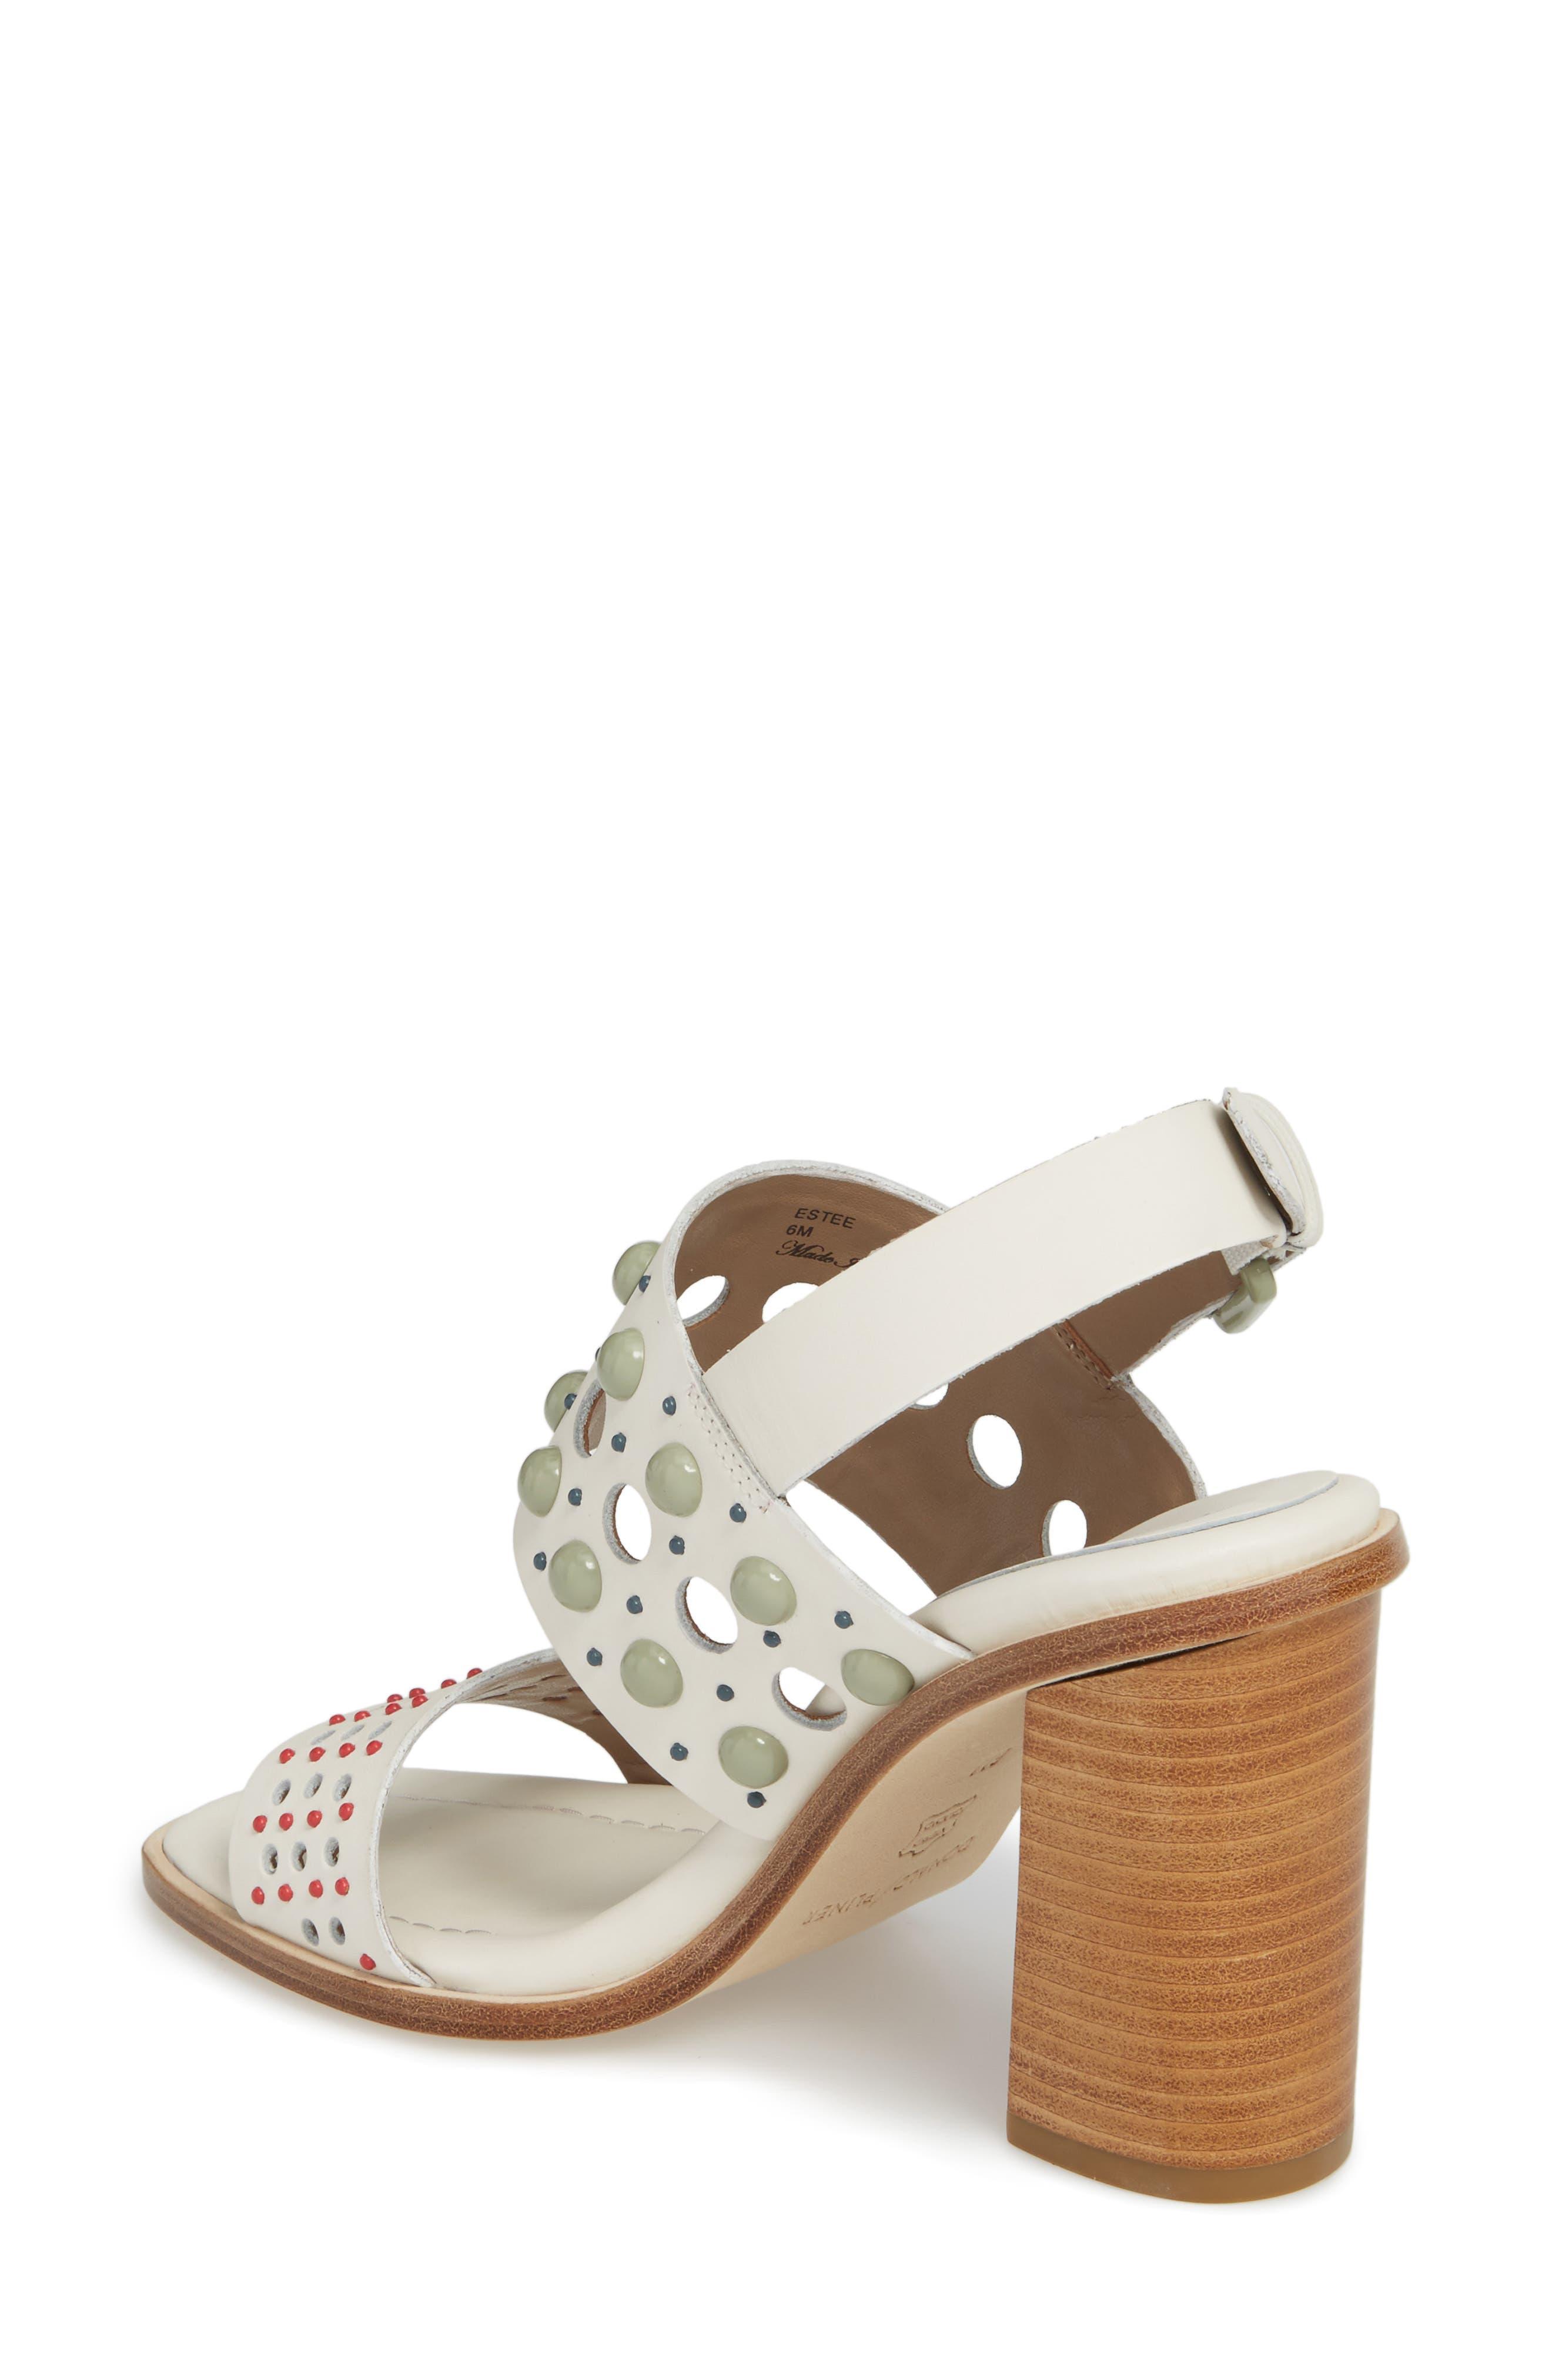 Estee Studded Sandal,                             Alternate thumbnail 2, color,                             Bone Leather